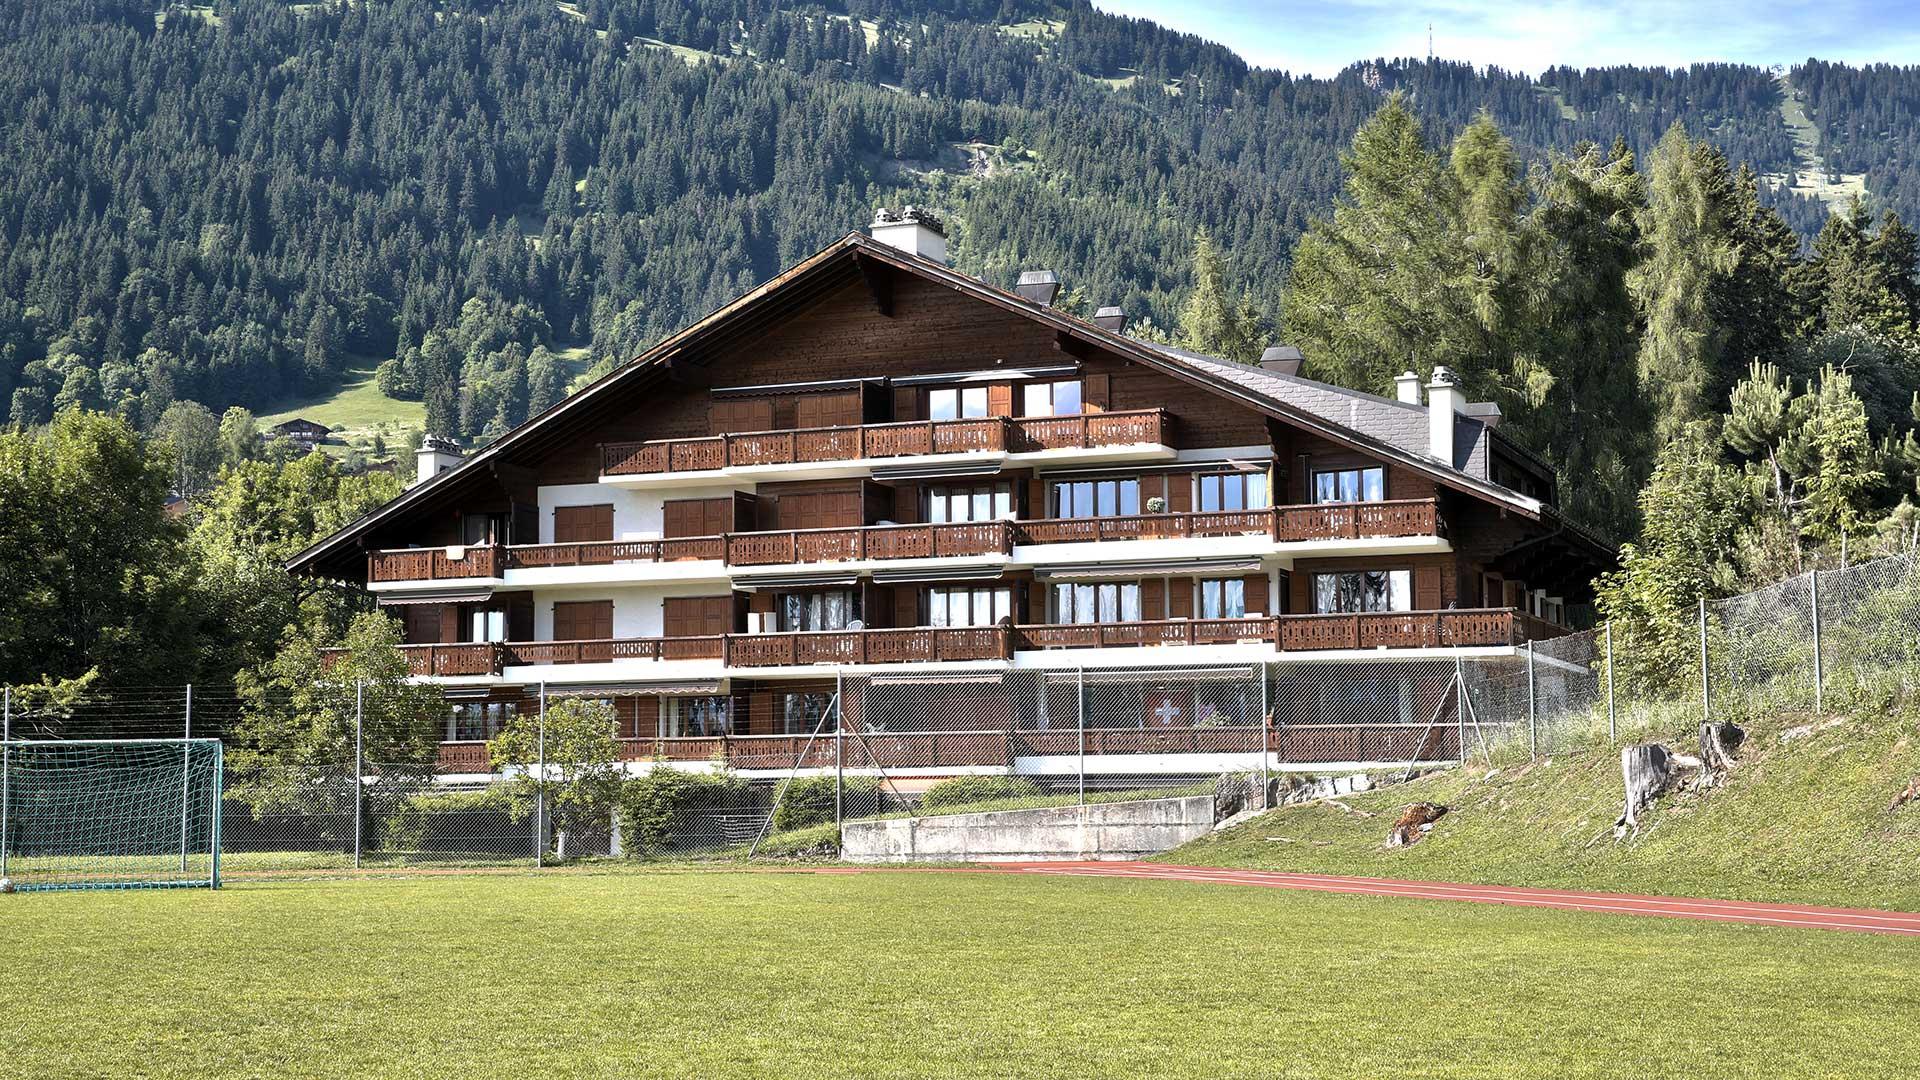 Vacances 18 Apartments, Switzerland